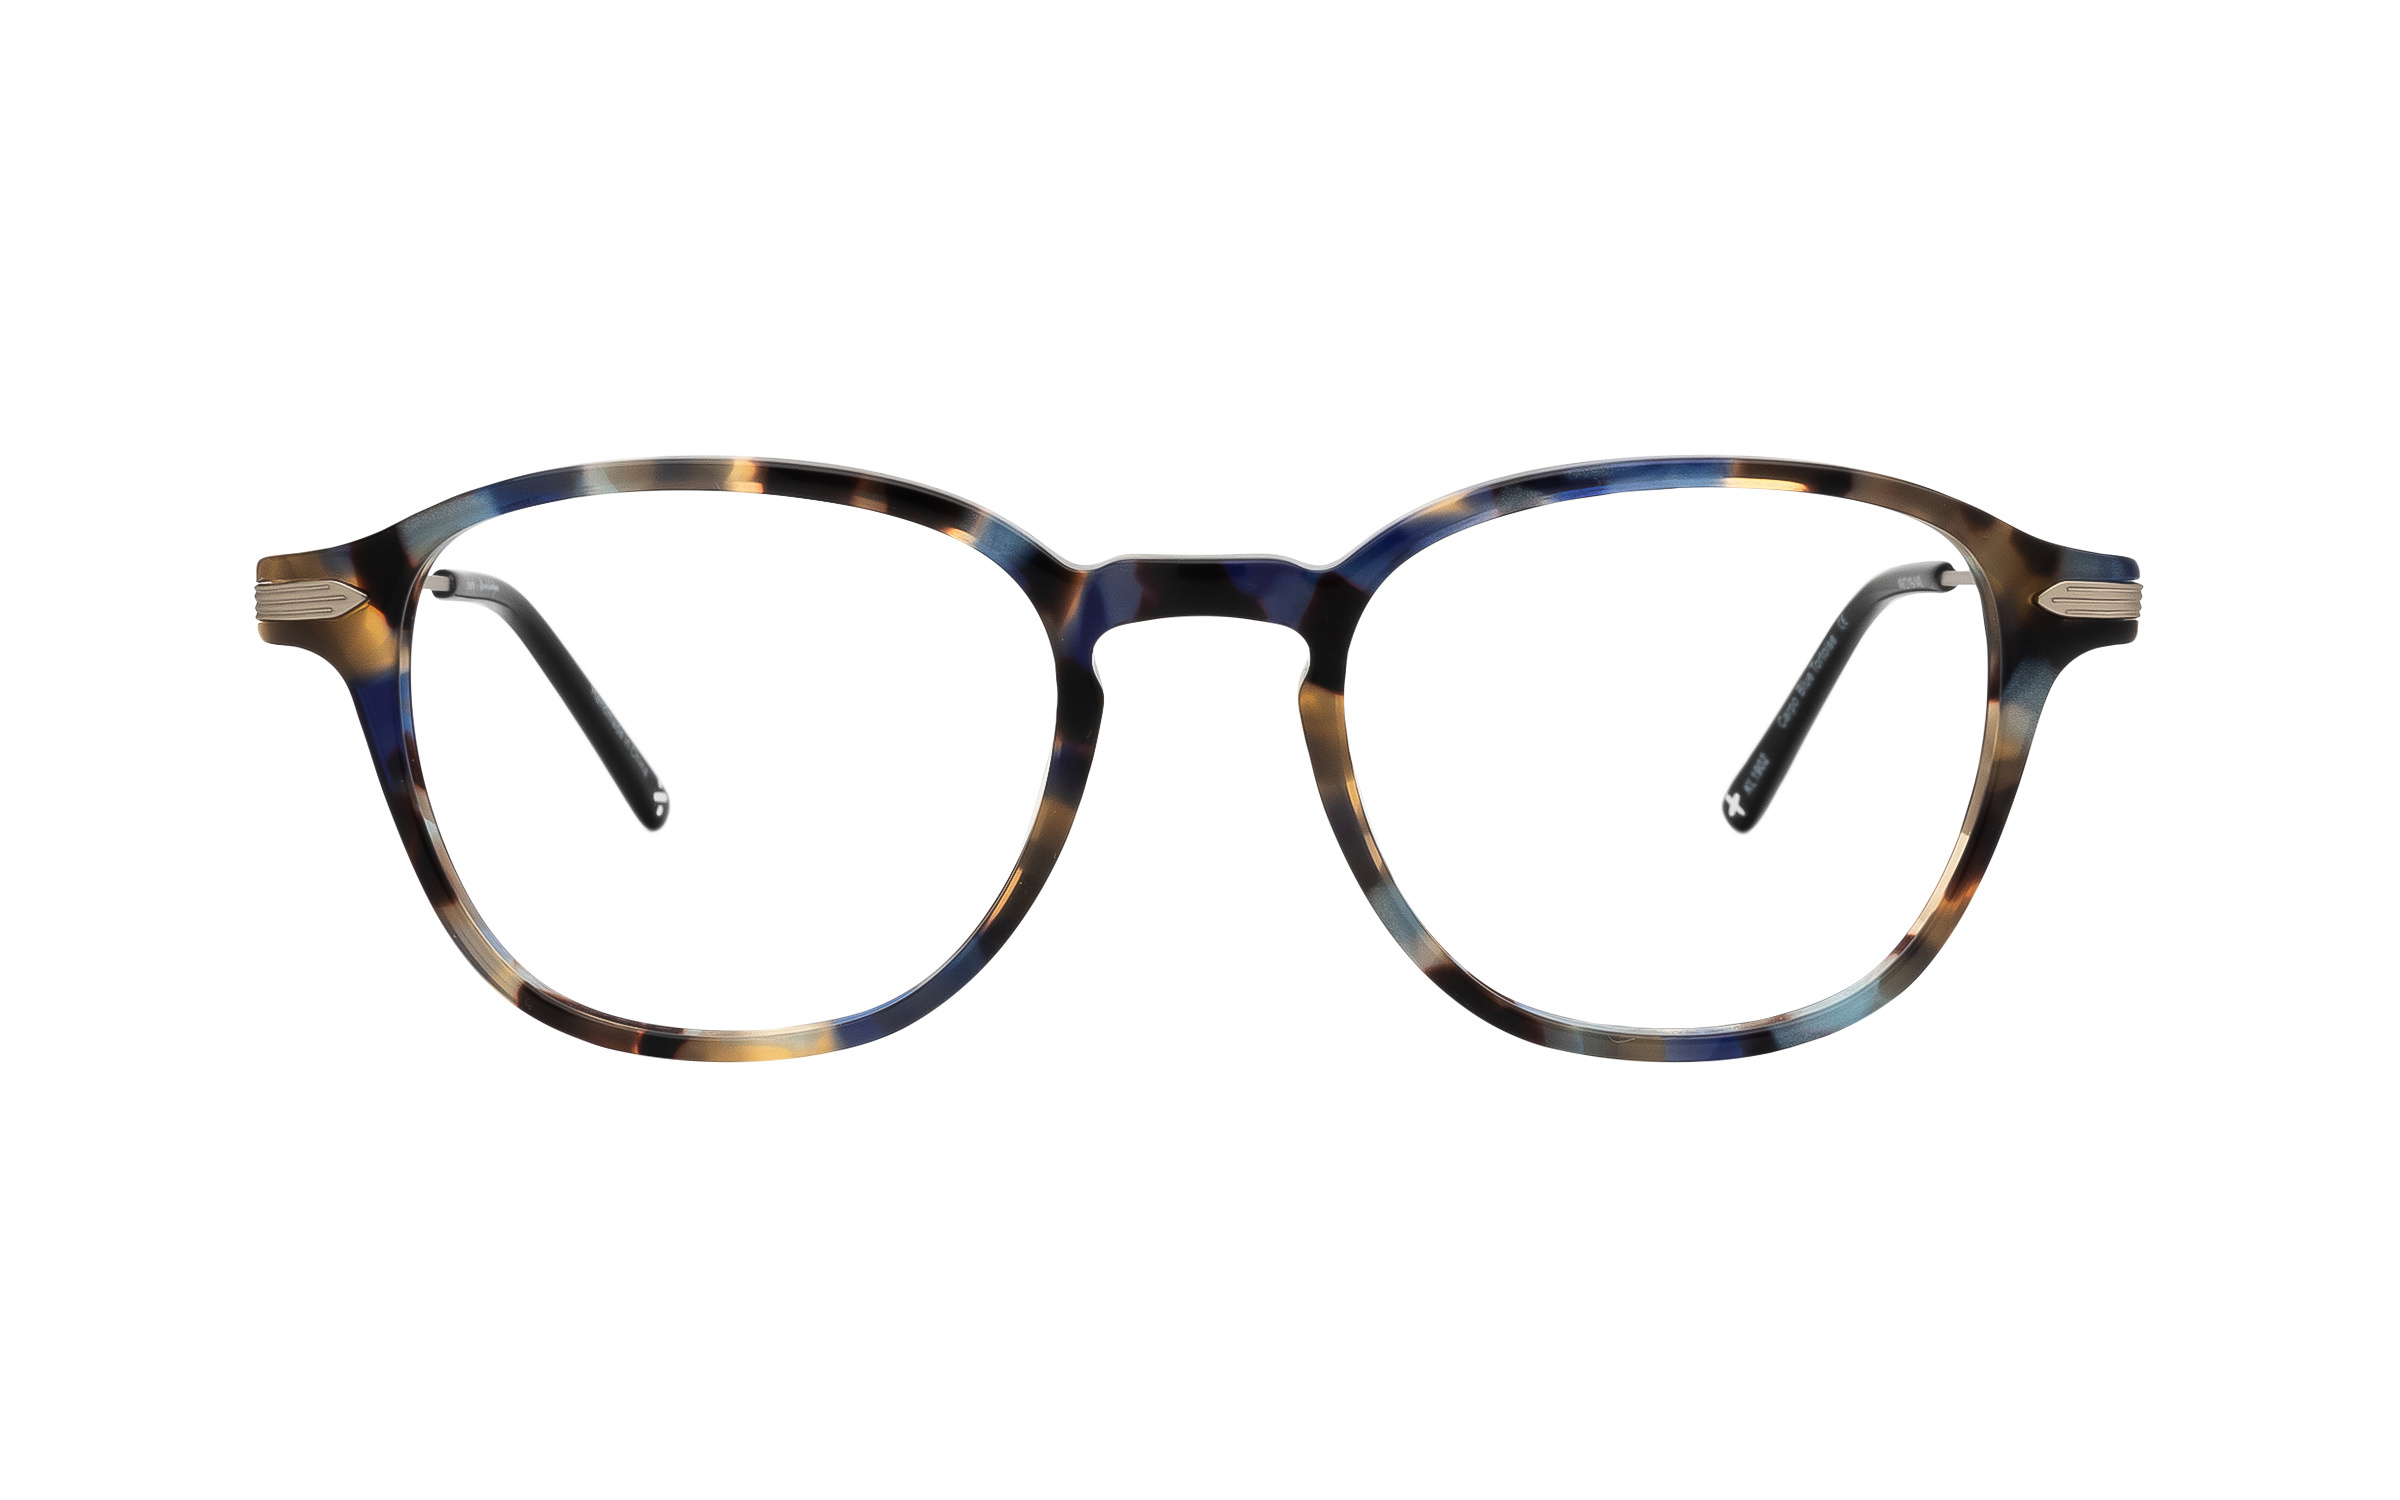 coastal.com - Derek Cardigan Carpo (49) Eyeglasses and Frame in Blue/Tortoise | Acetate/Metal – Online Coastal 55.00 USD